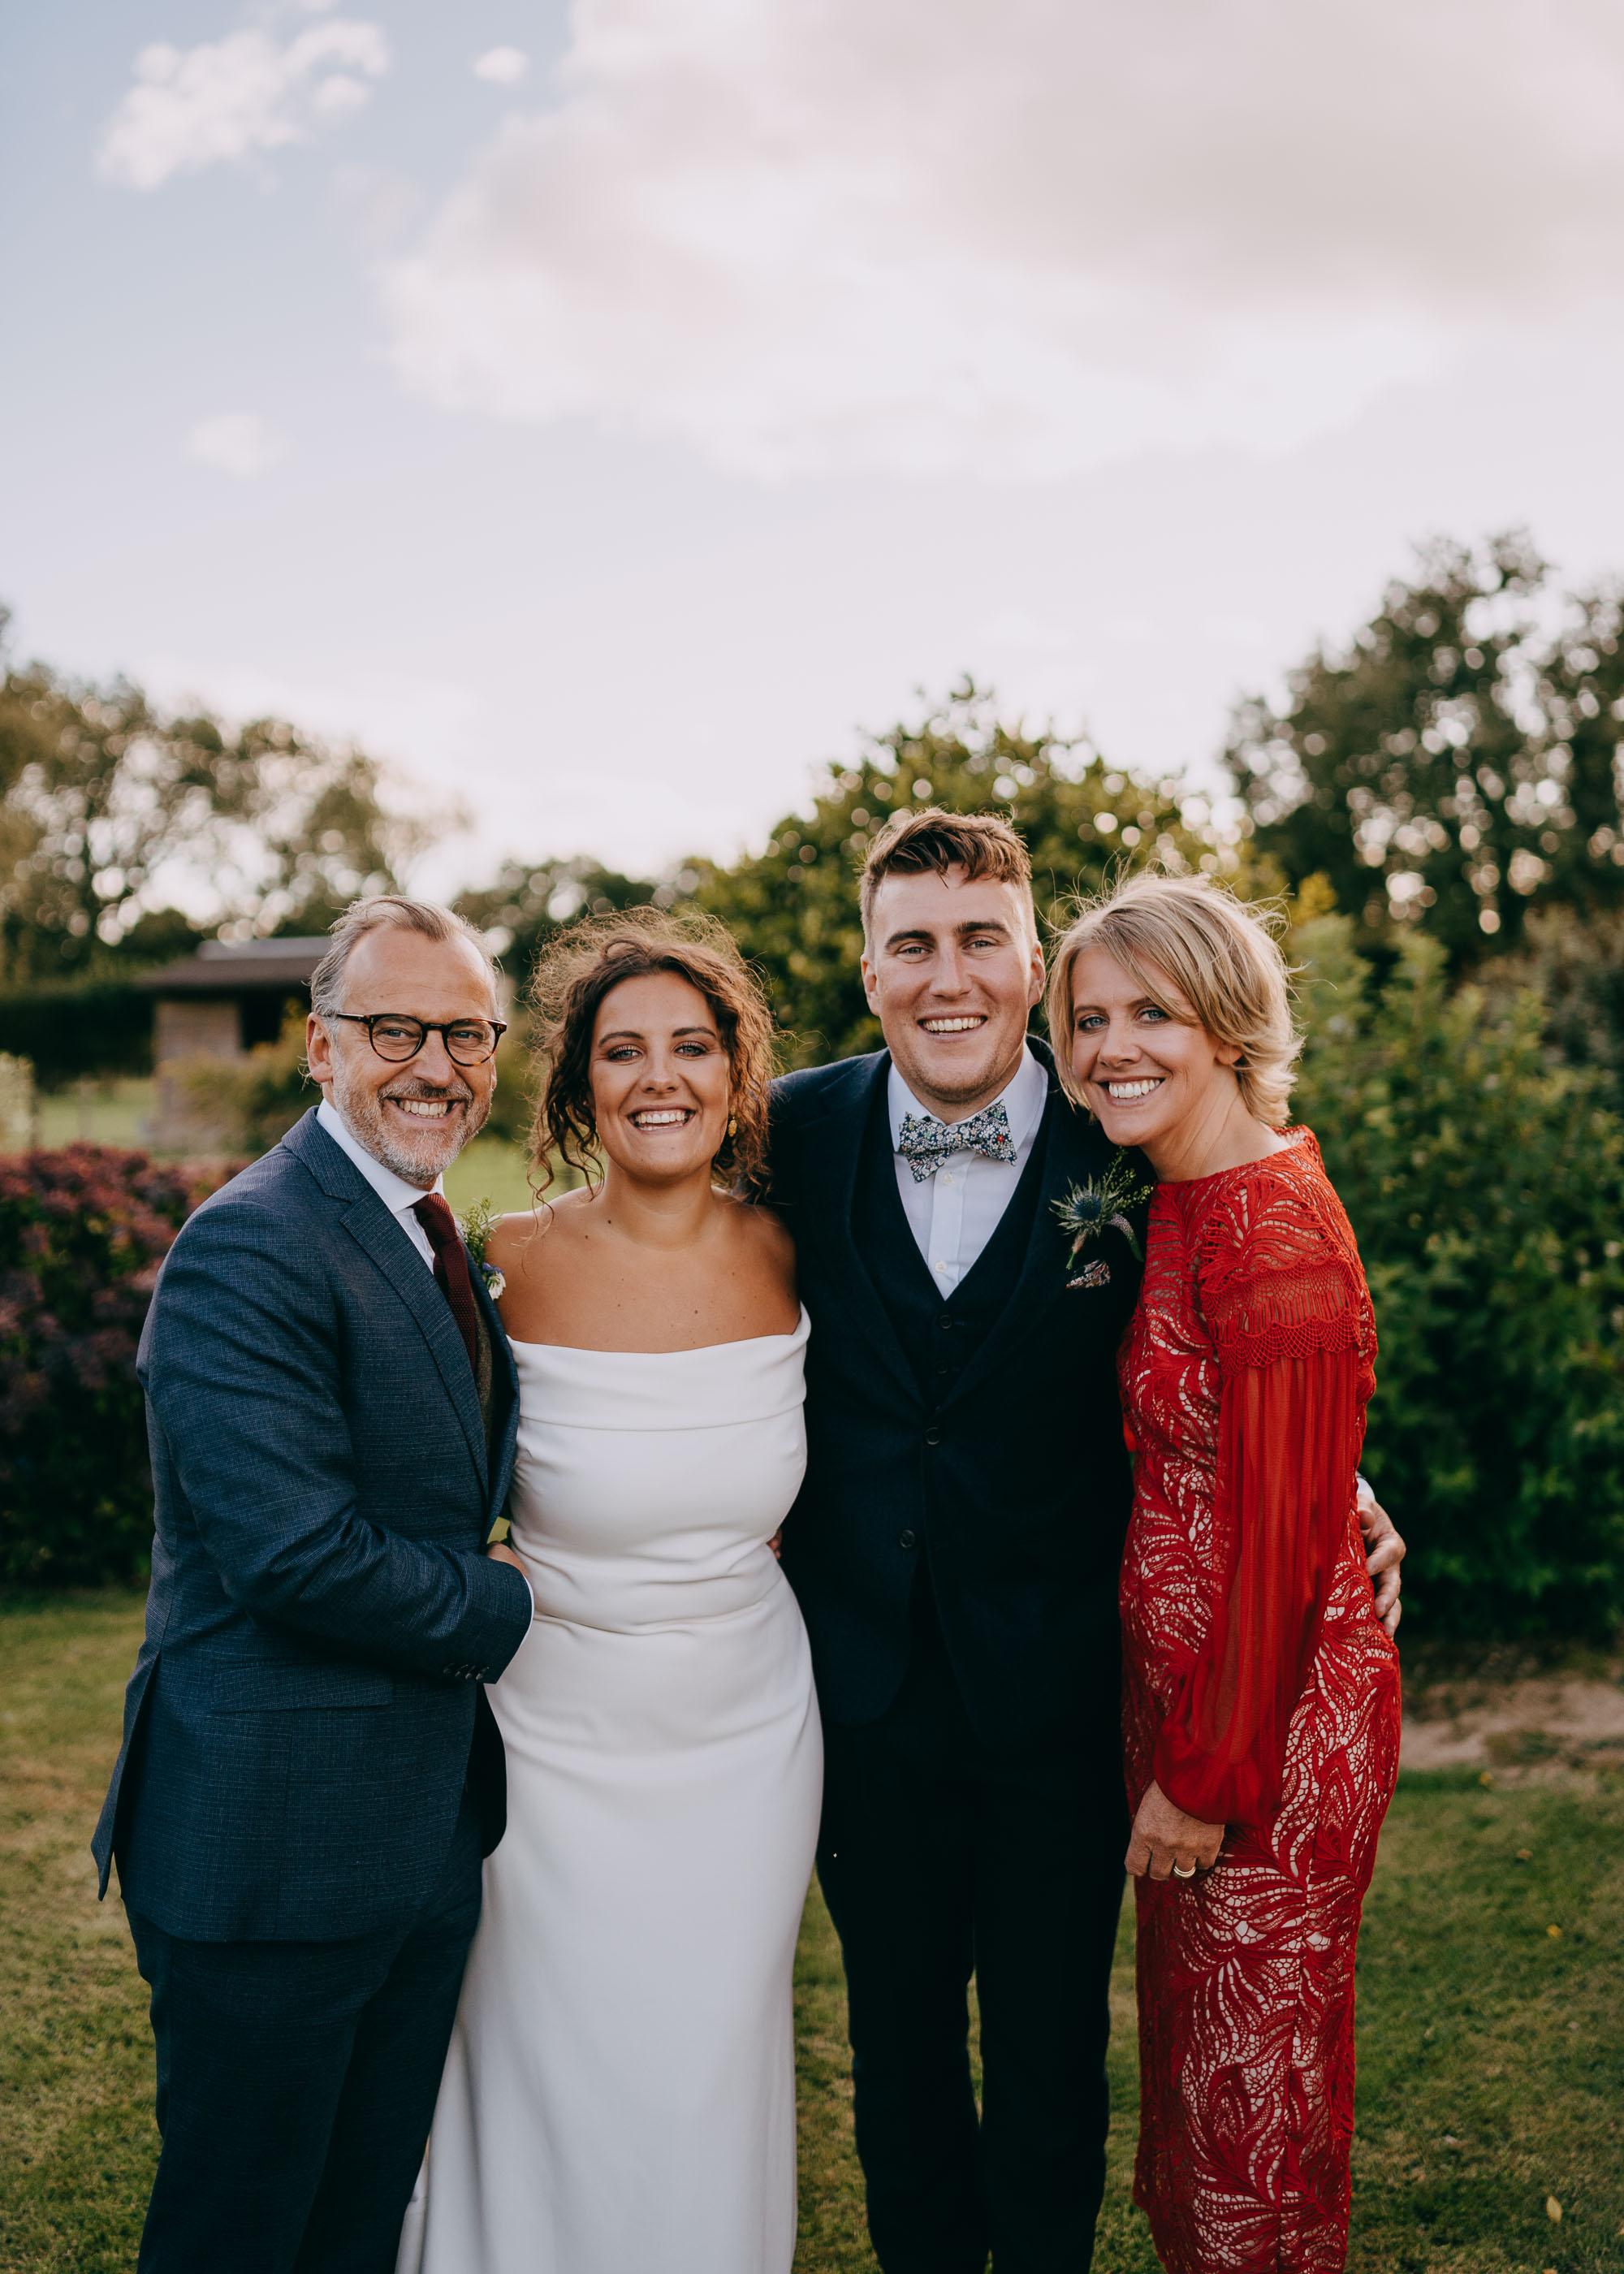 Family Portrait during Canterbury Wedding, Kent